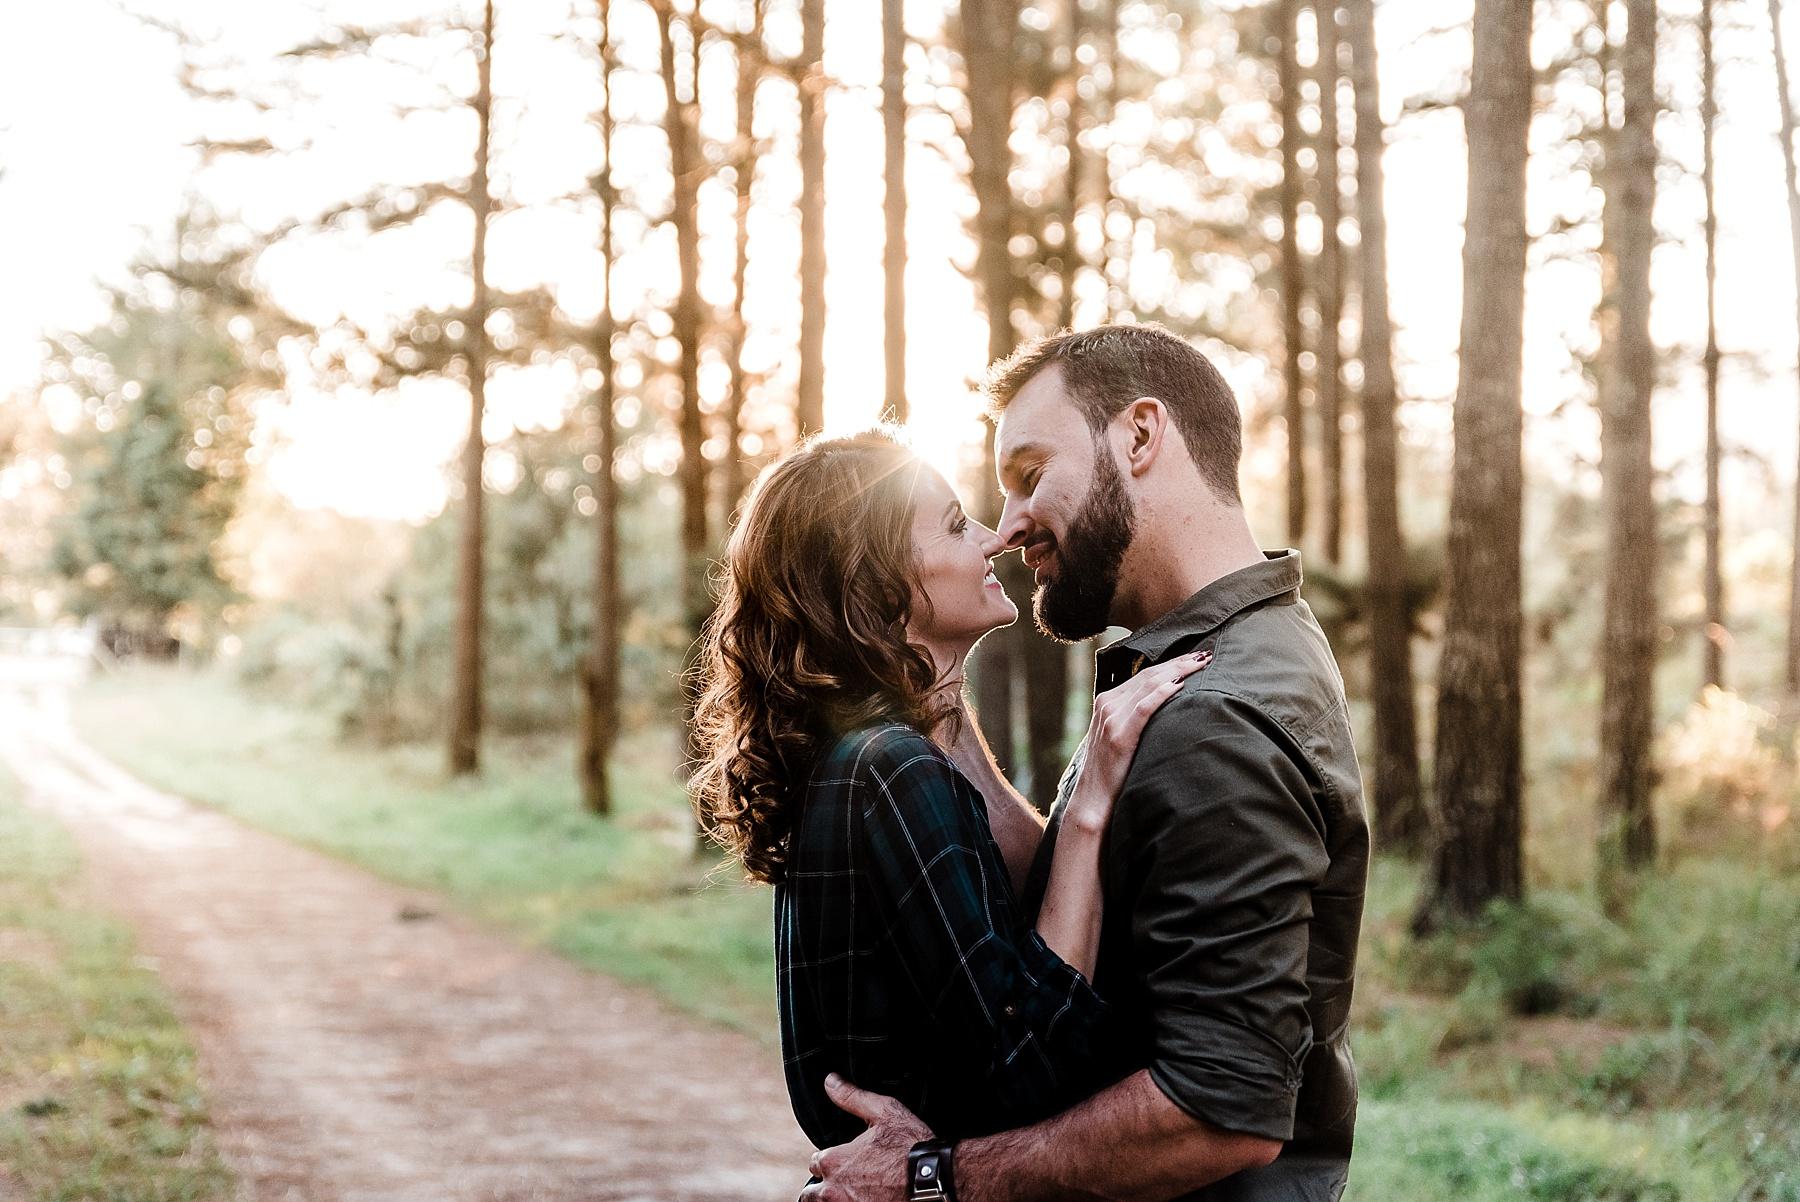 Anree & Stefan | Engagement